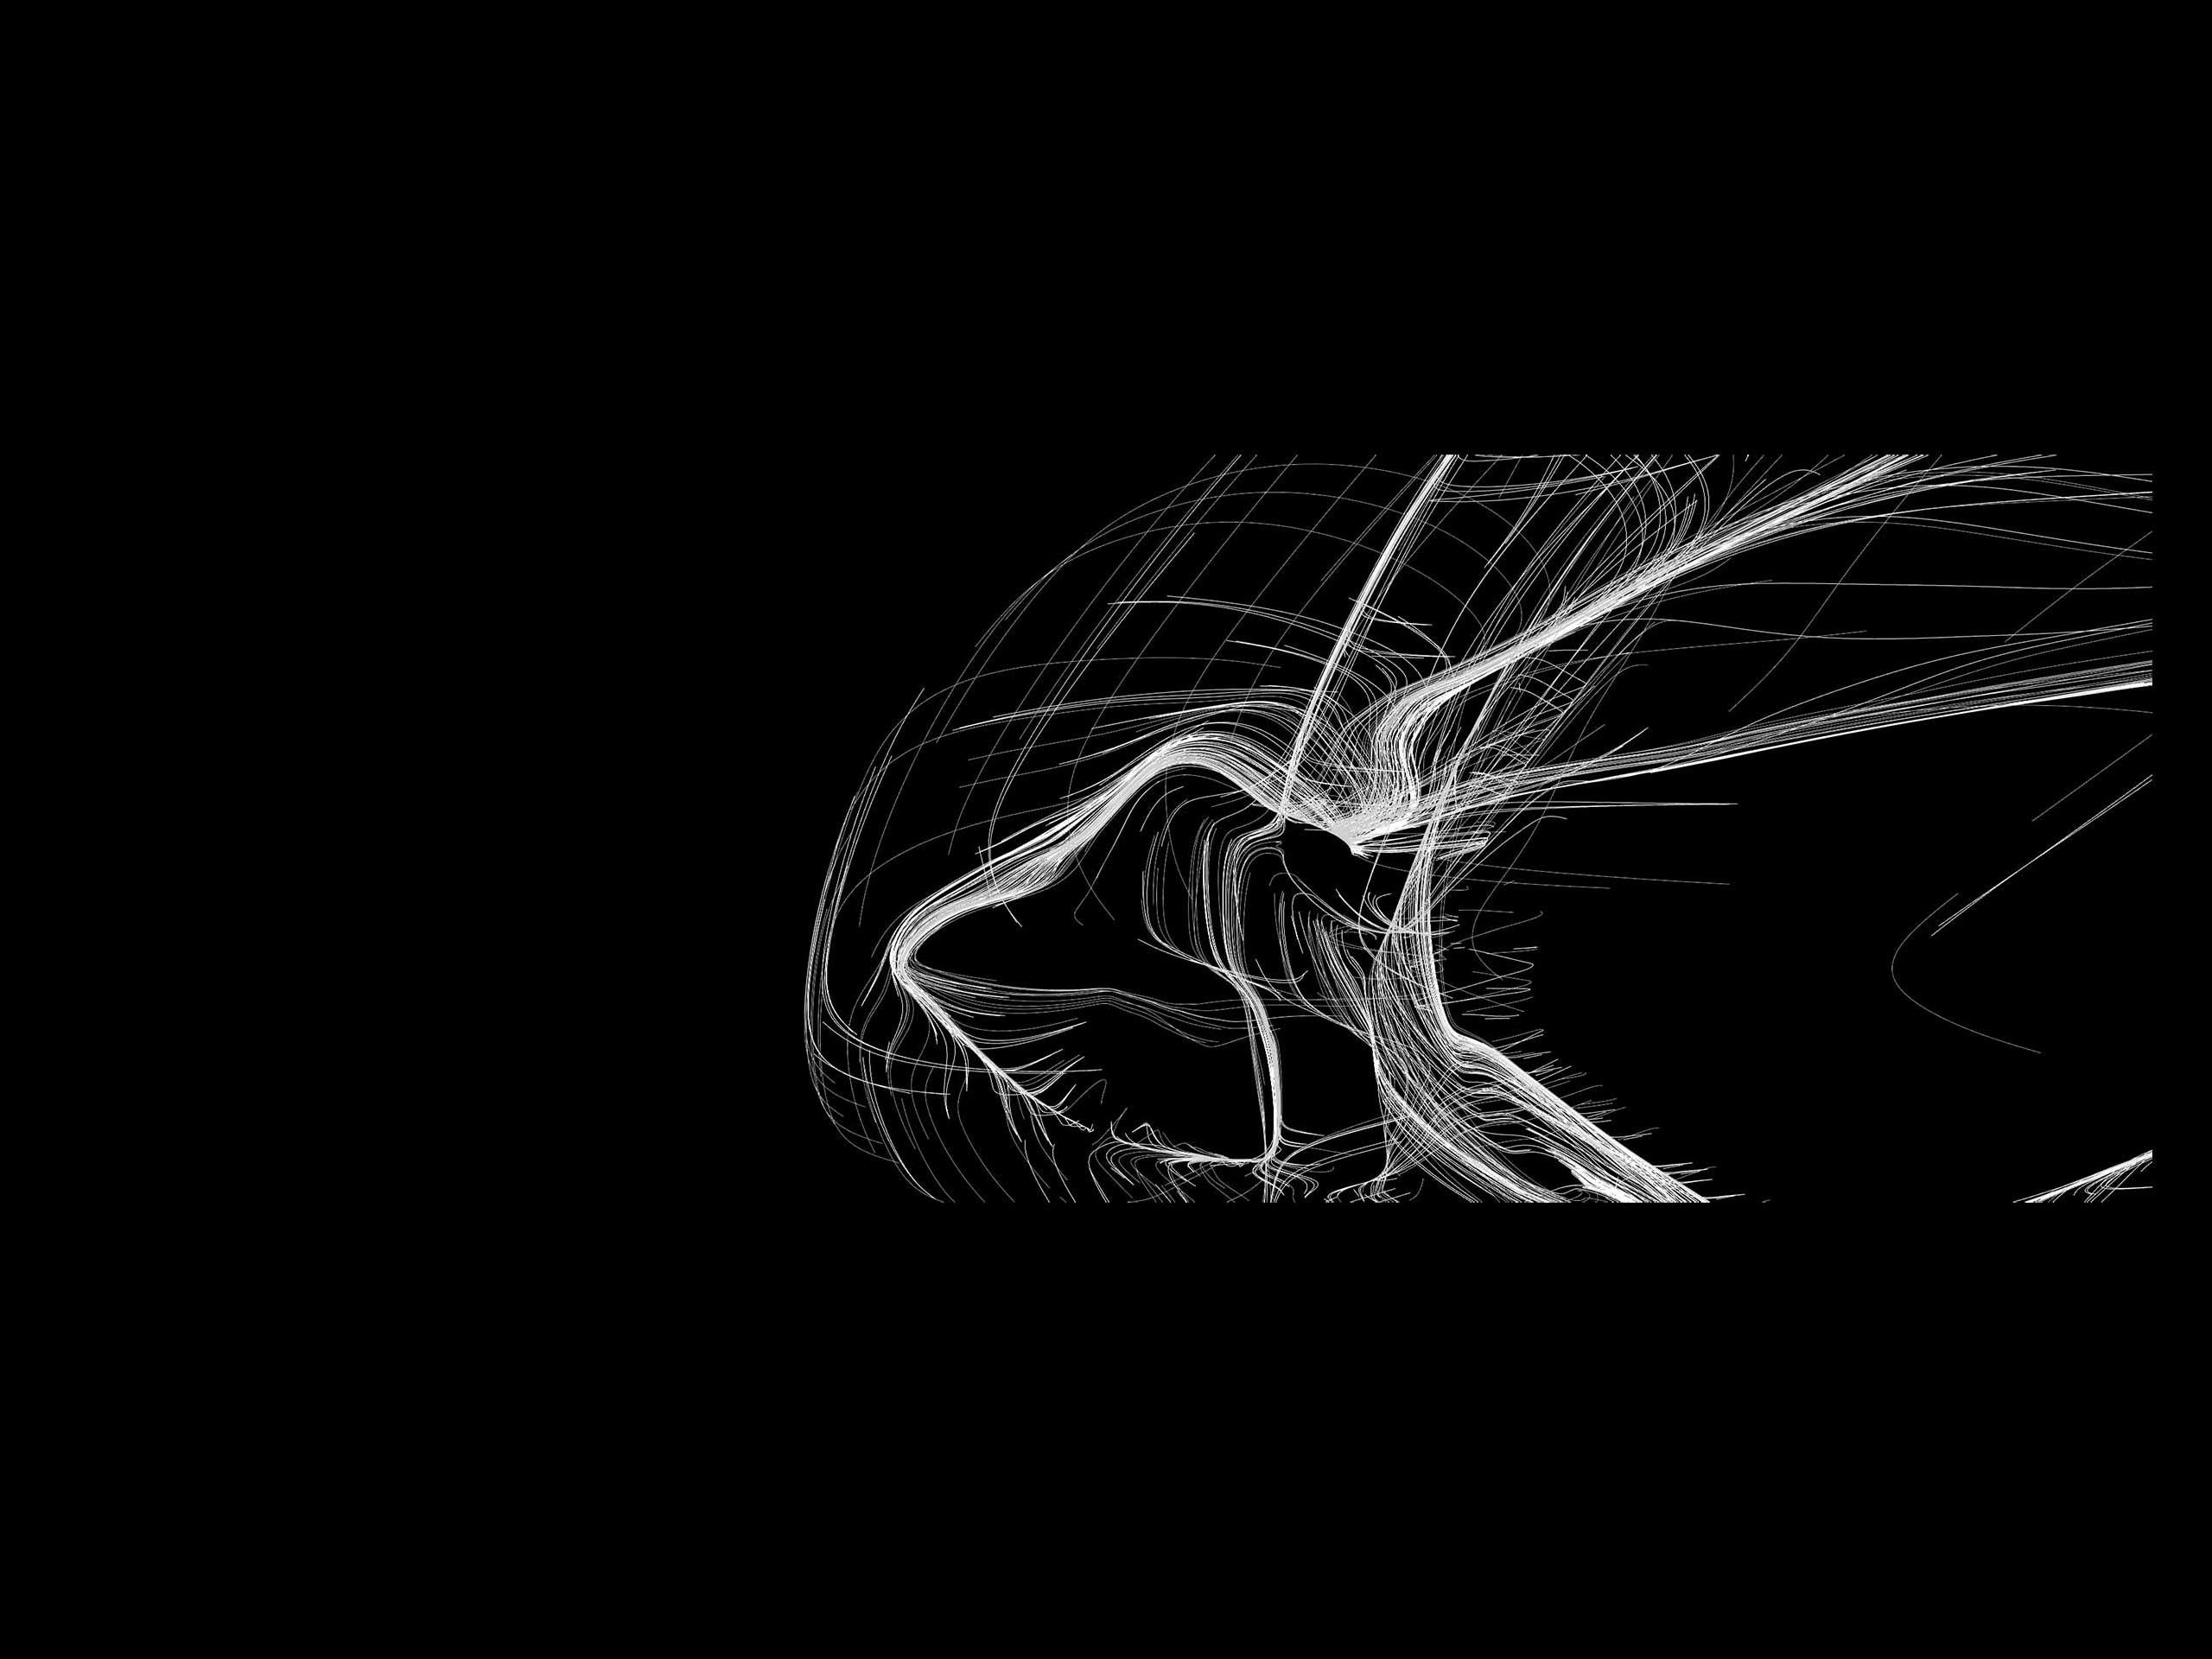 Flow detail and computational design